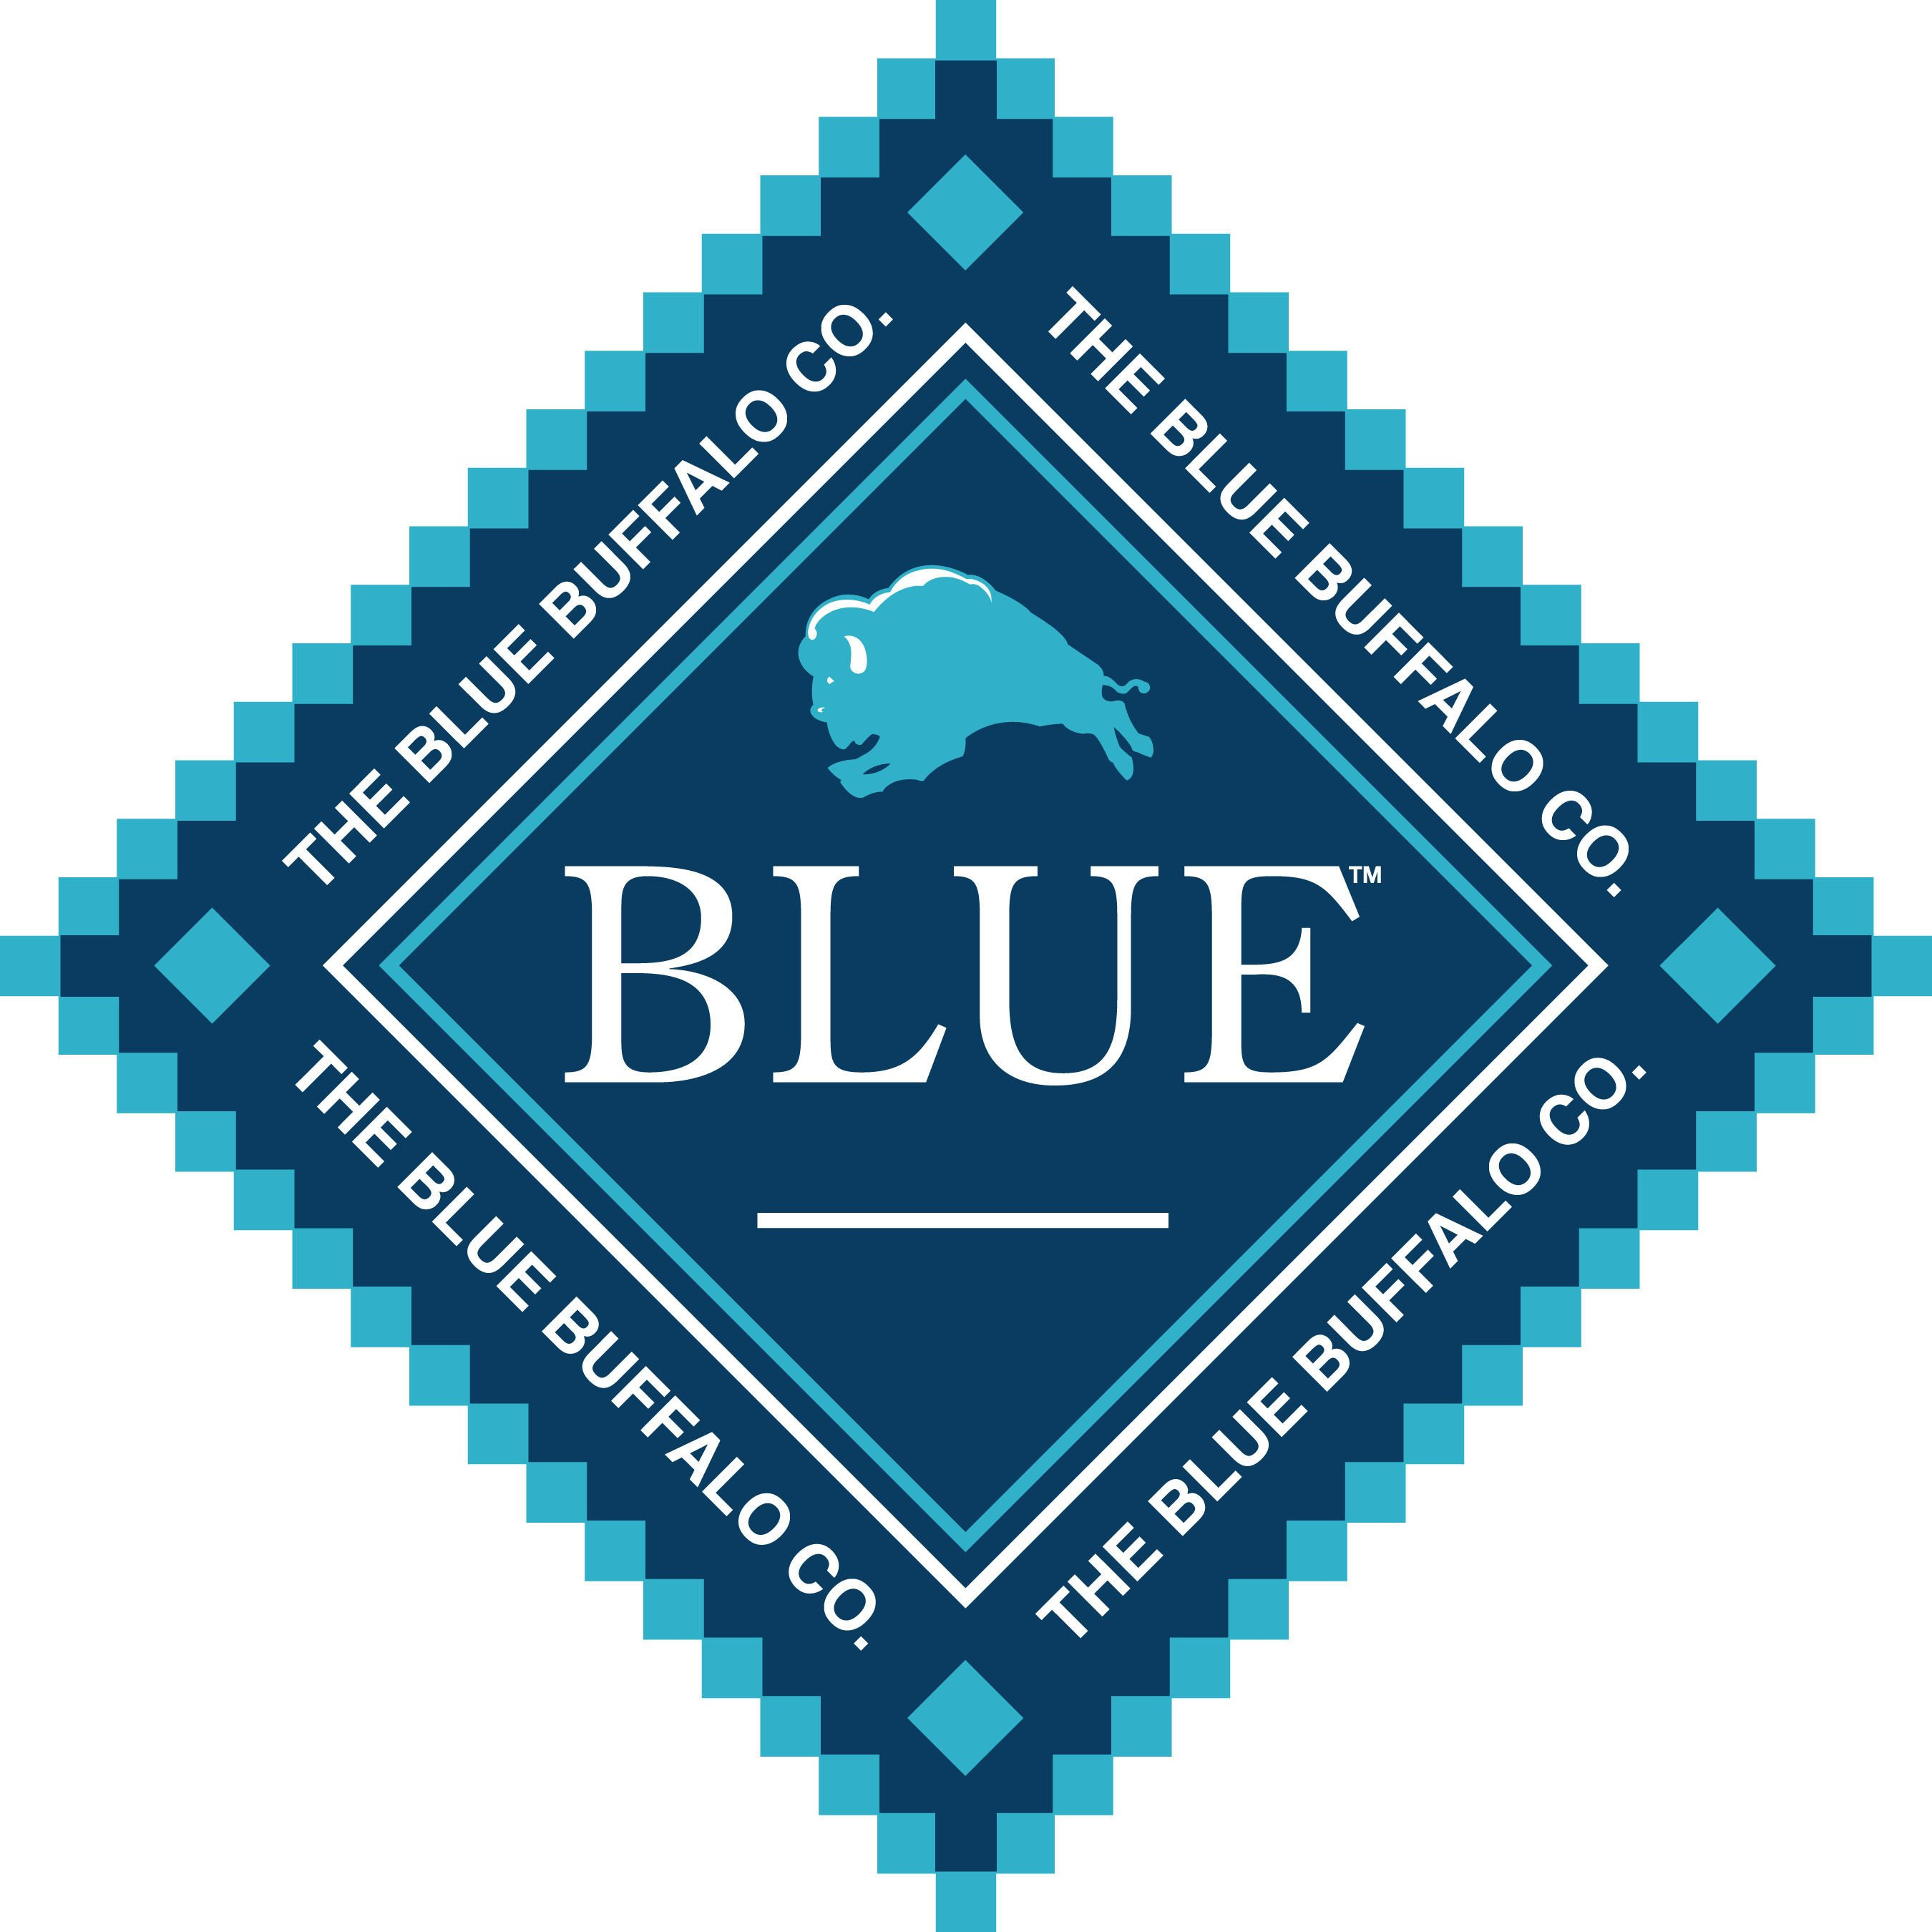 Blue Buffalo Pet Products logo